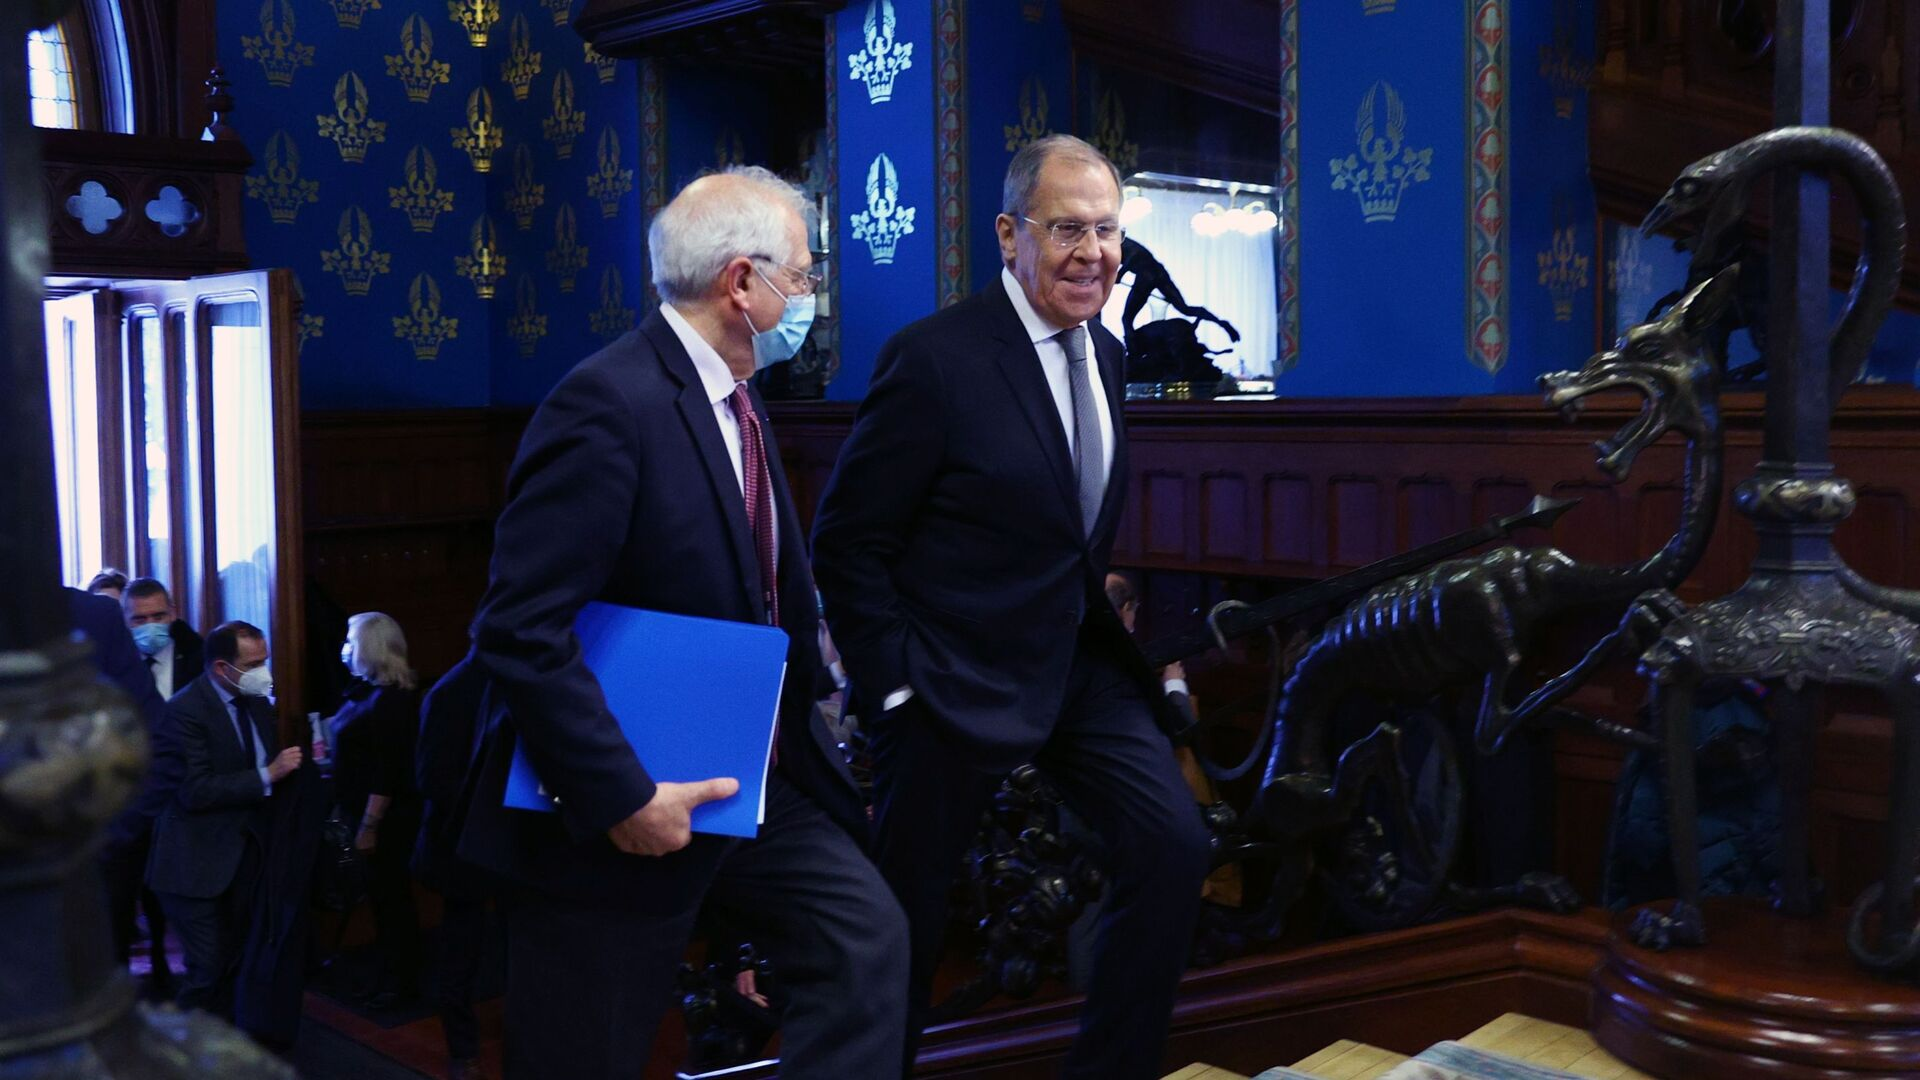 El jefe de la diplomacia europea, Josep Borrell, y el canciller ruso, Serguéi Lavrov - Sputnik Mundo, 1920, 05.02.2021